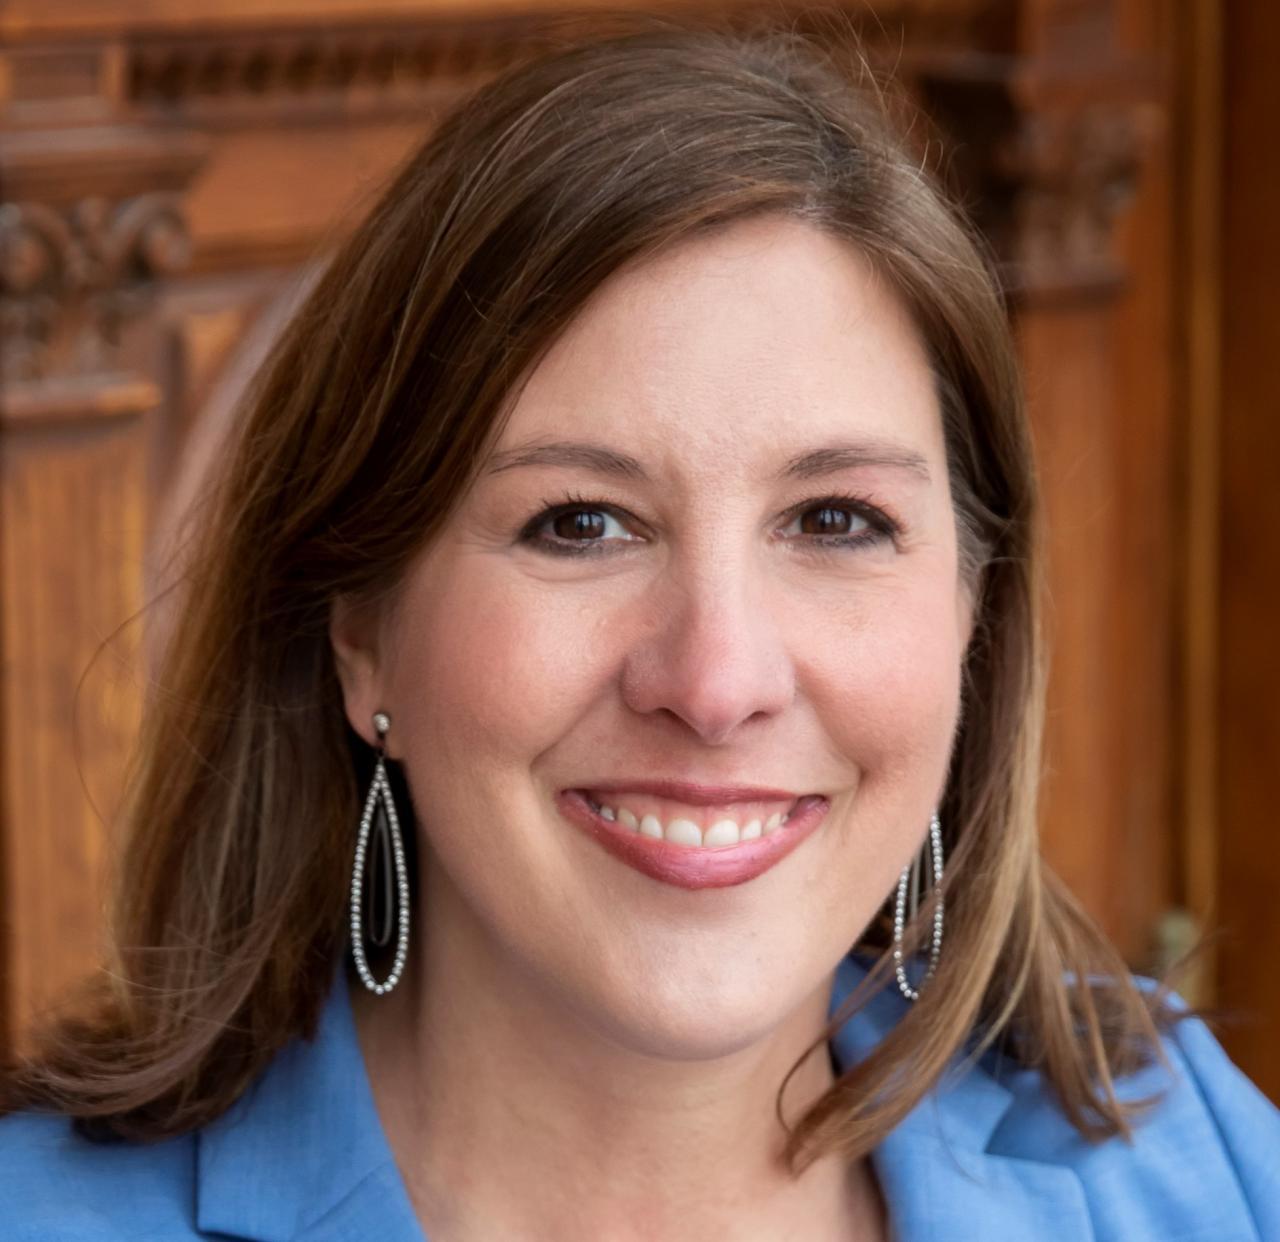 Thumbnail Image of Christie Appelhanz, Regional Administrator, Region 7